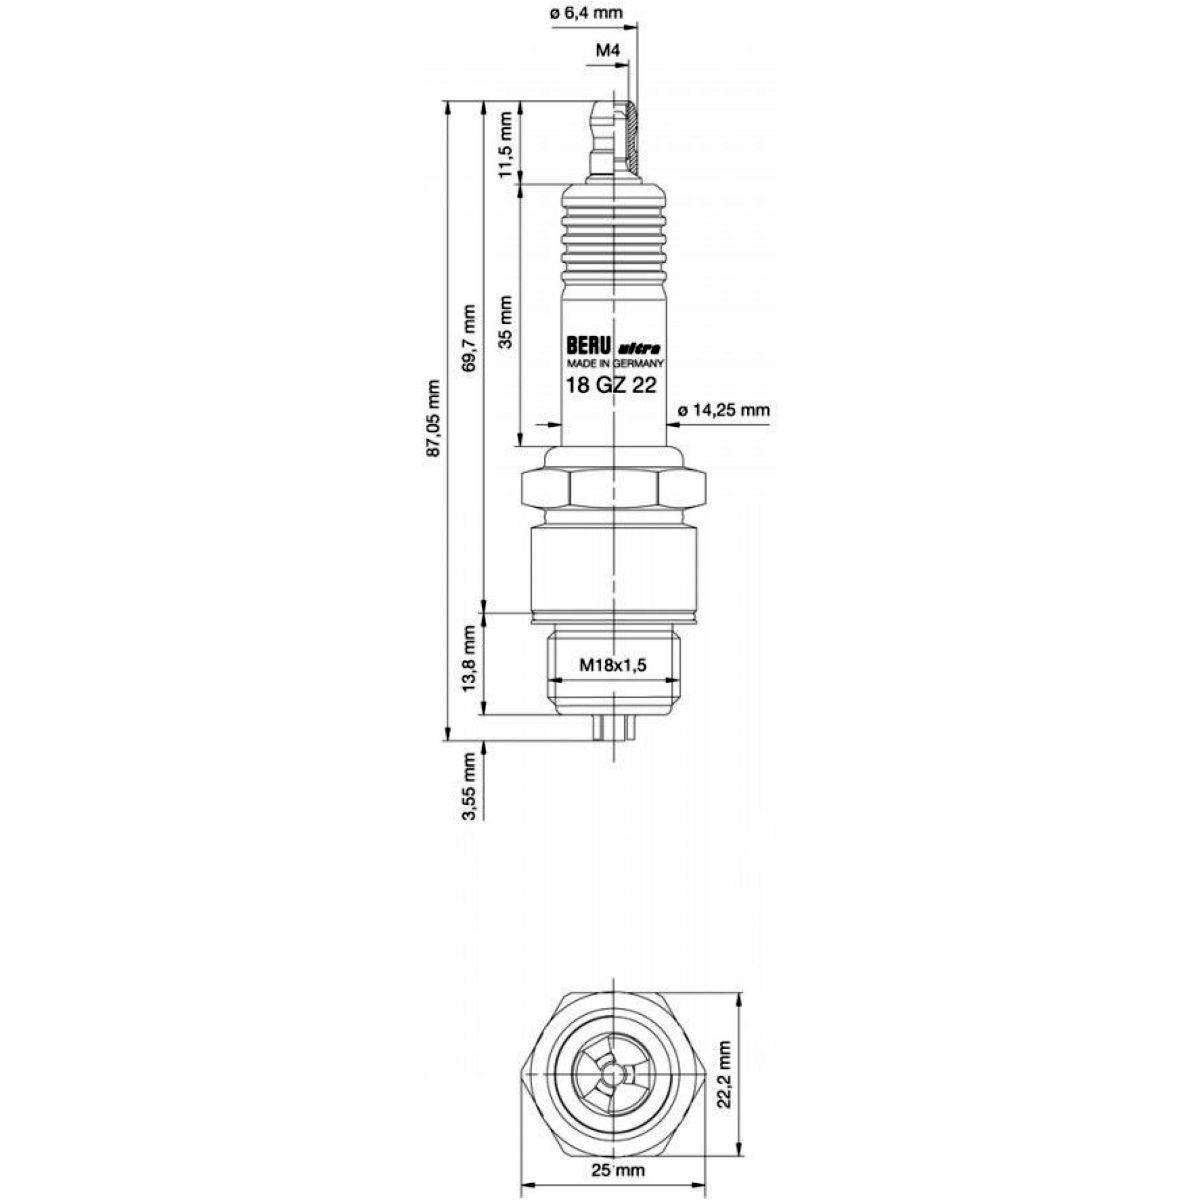 VW AUDI ENGINE RADIATOR FAN STICKER 100 CC UR QUATTRO WB WR B2 C3 443 959  455 K archives.statelegals.staradvertiser.comarchives.statelegals.staradvertiser.com